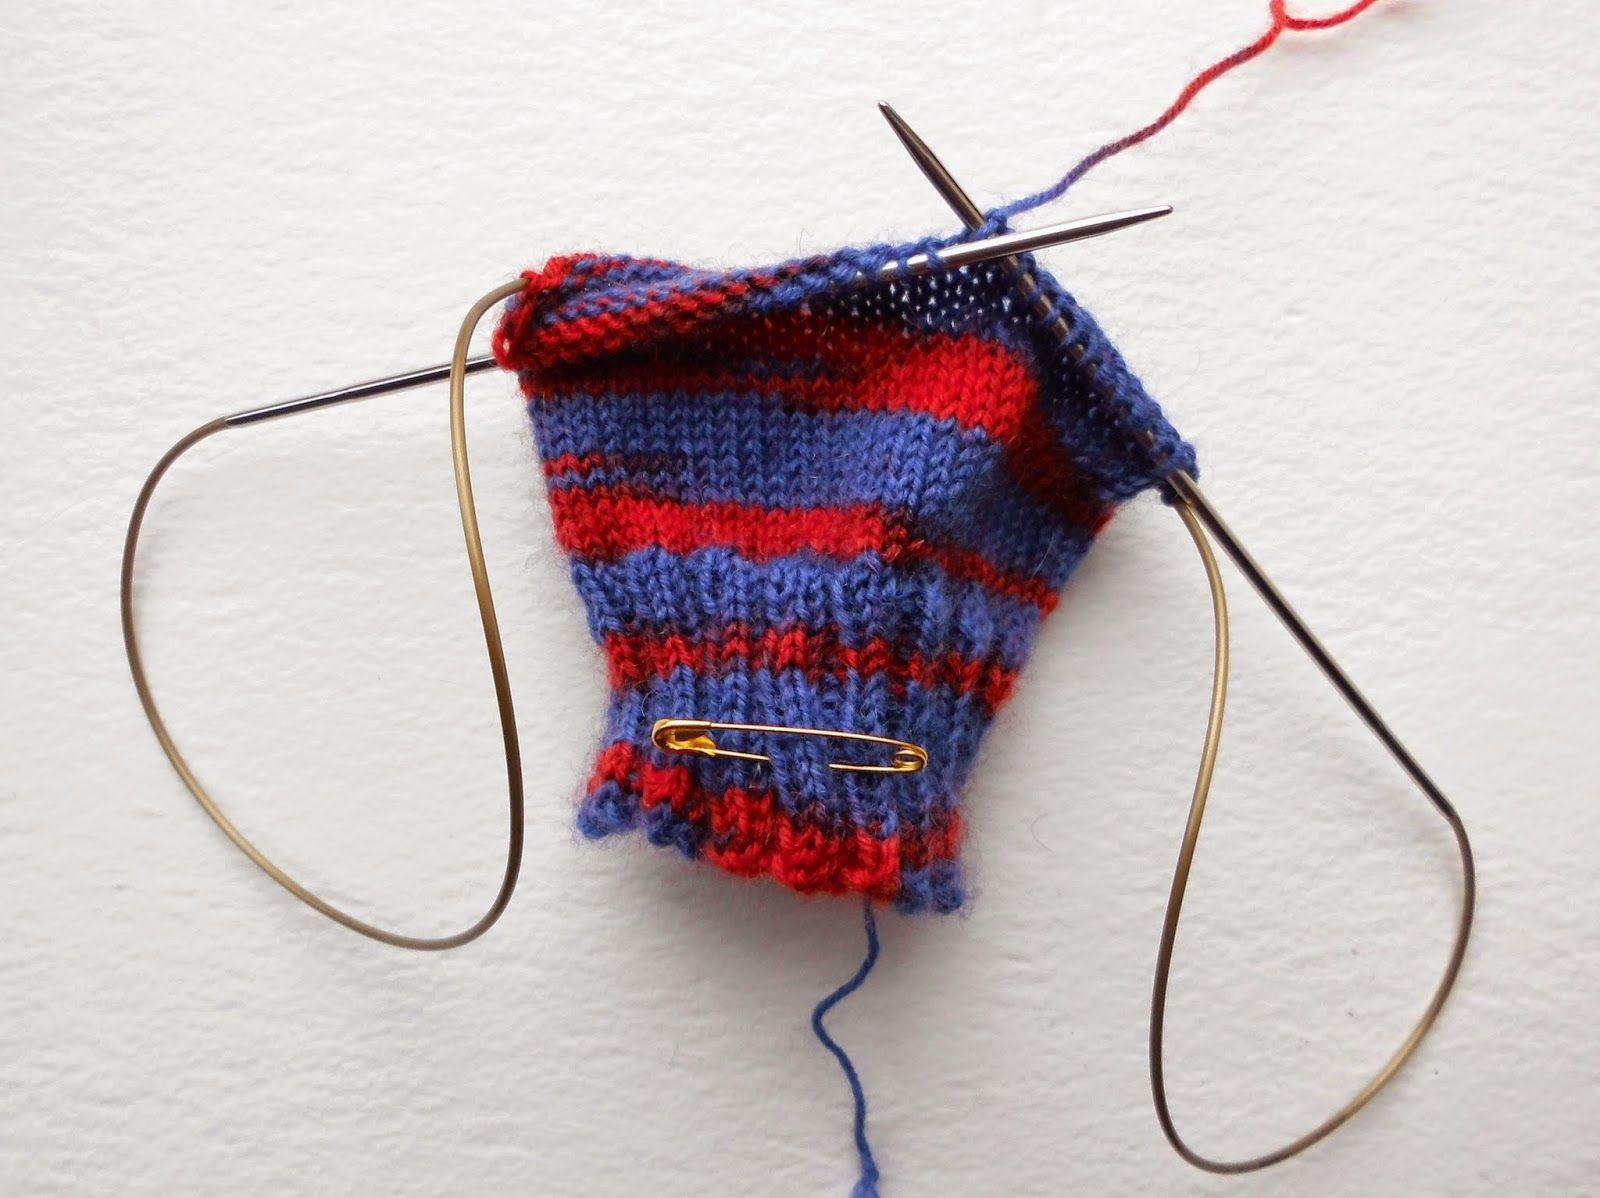 Example of knitting using long circular needle for magic loop ...